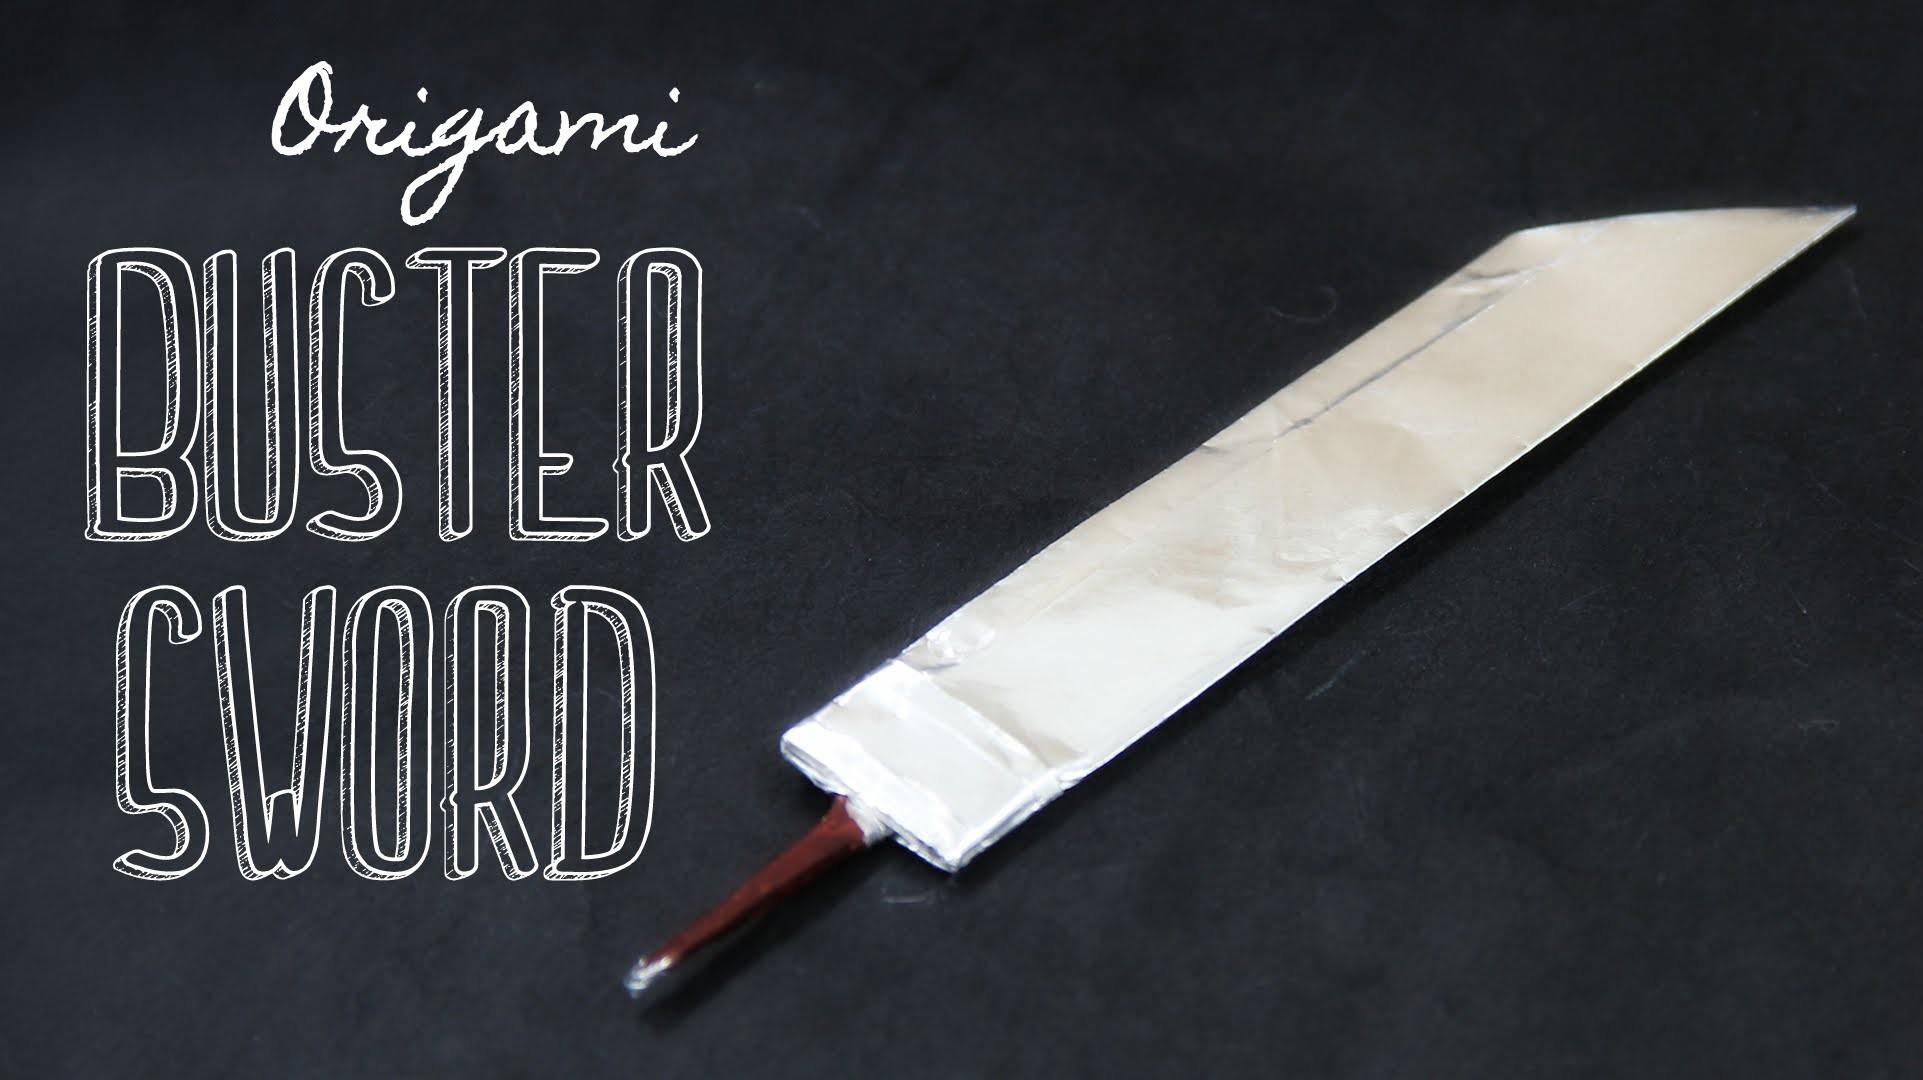 How to make an origami Buster Sword (Tadashi Mori)